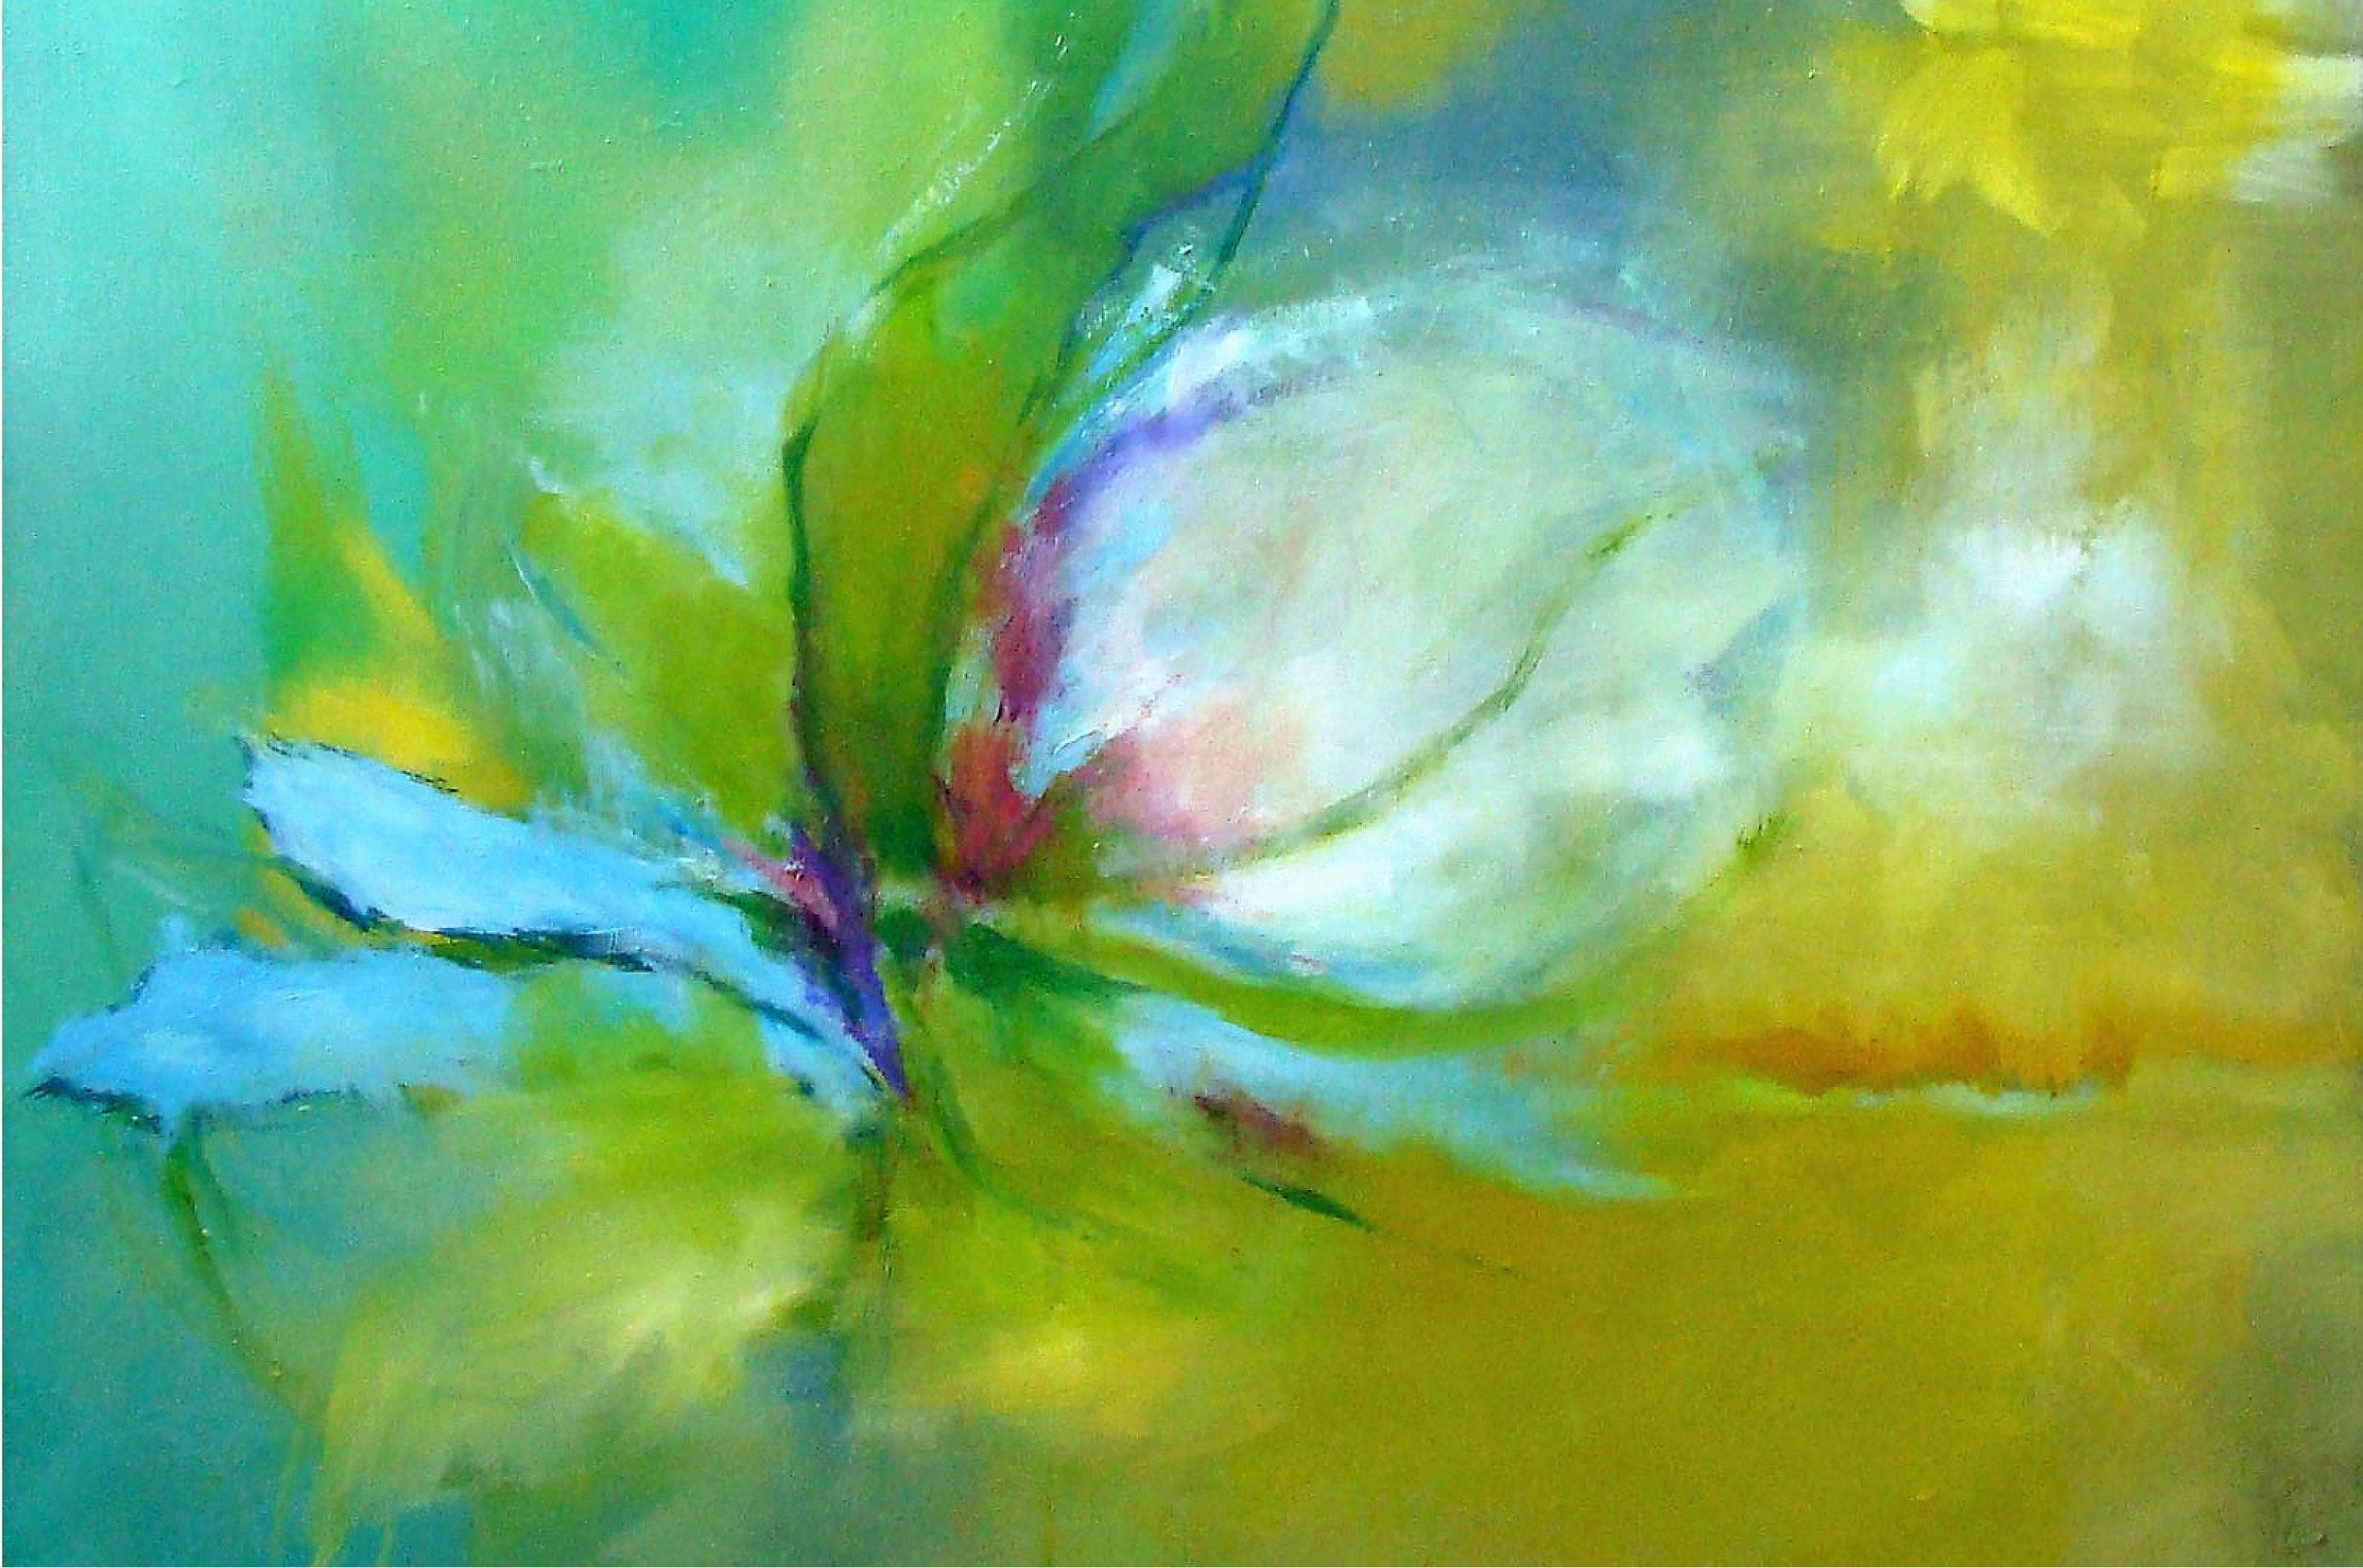 le printemps - selected works